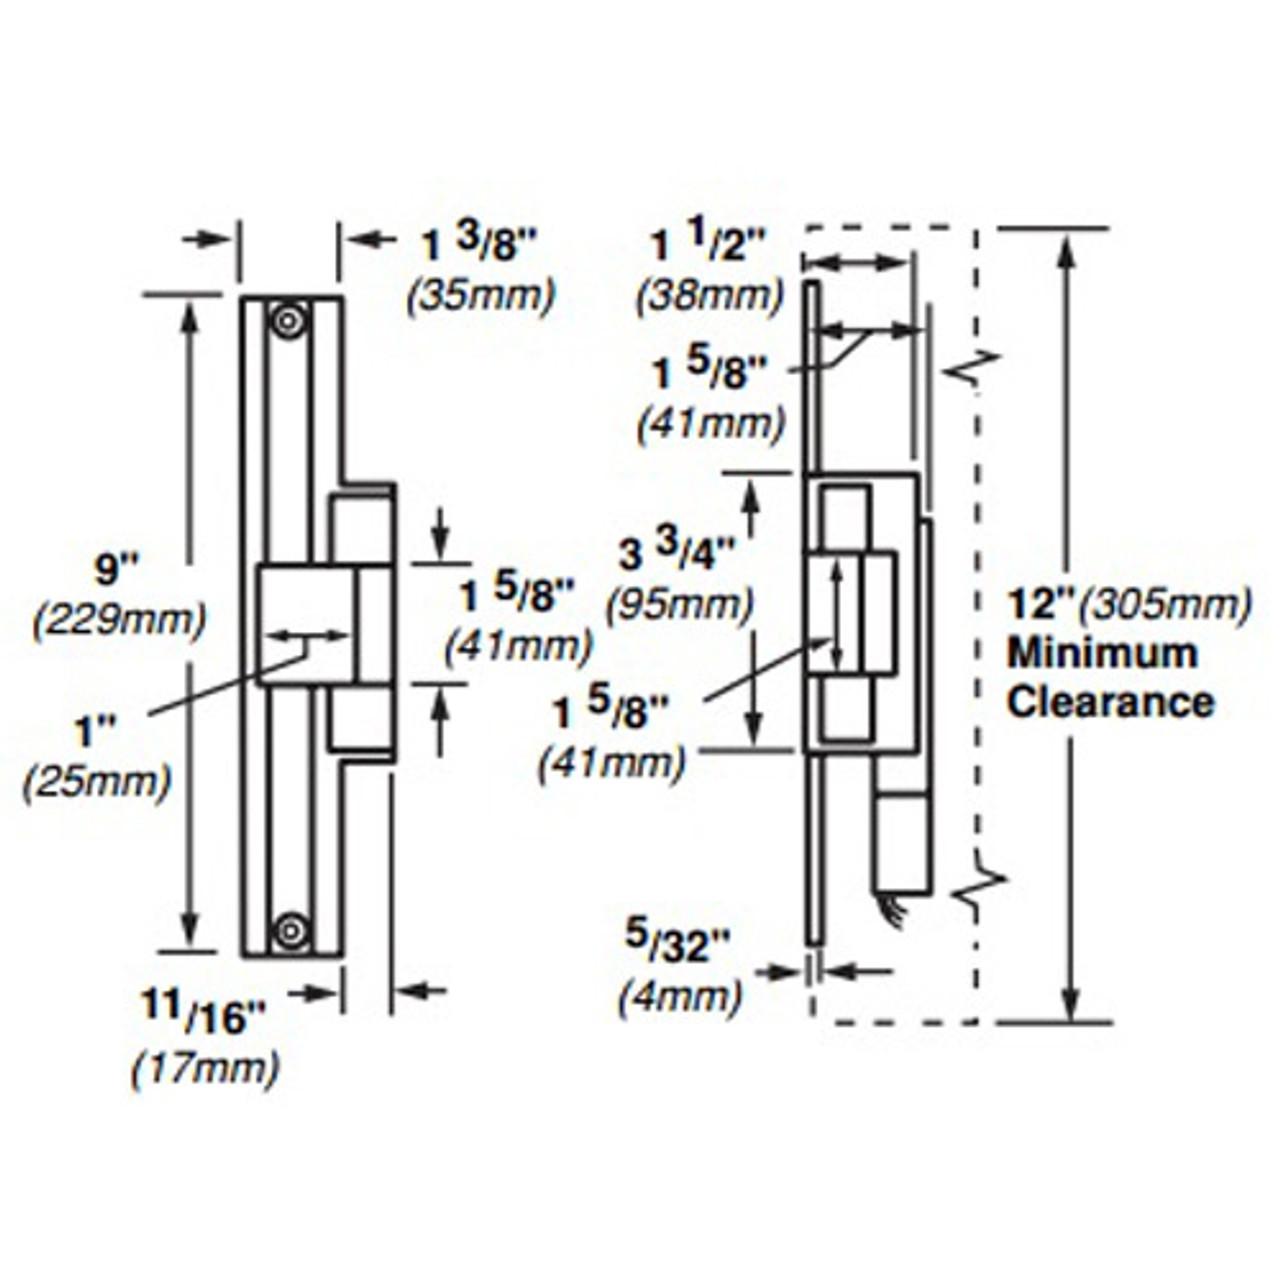 6224AL-24VDC-US4 Von Duprin Electric Strike for Mortise or Cylindrical Locksets in Satin Brass Finish